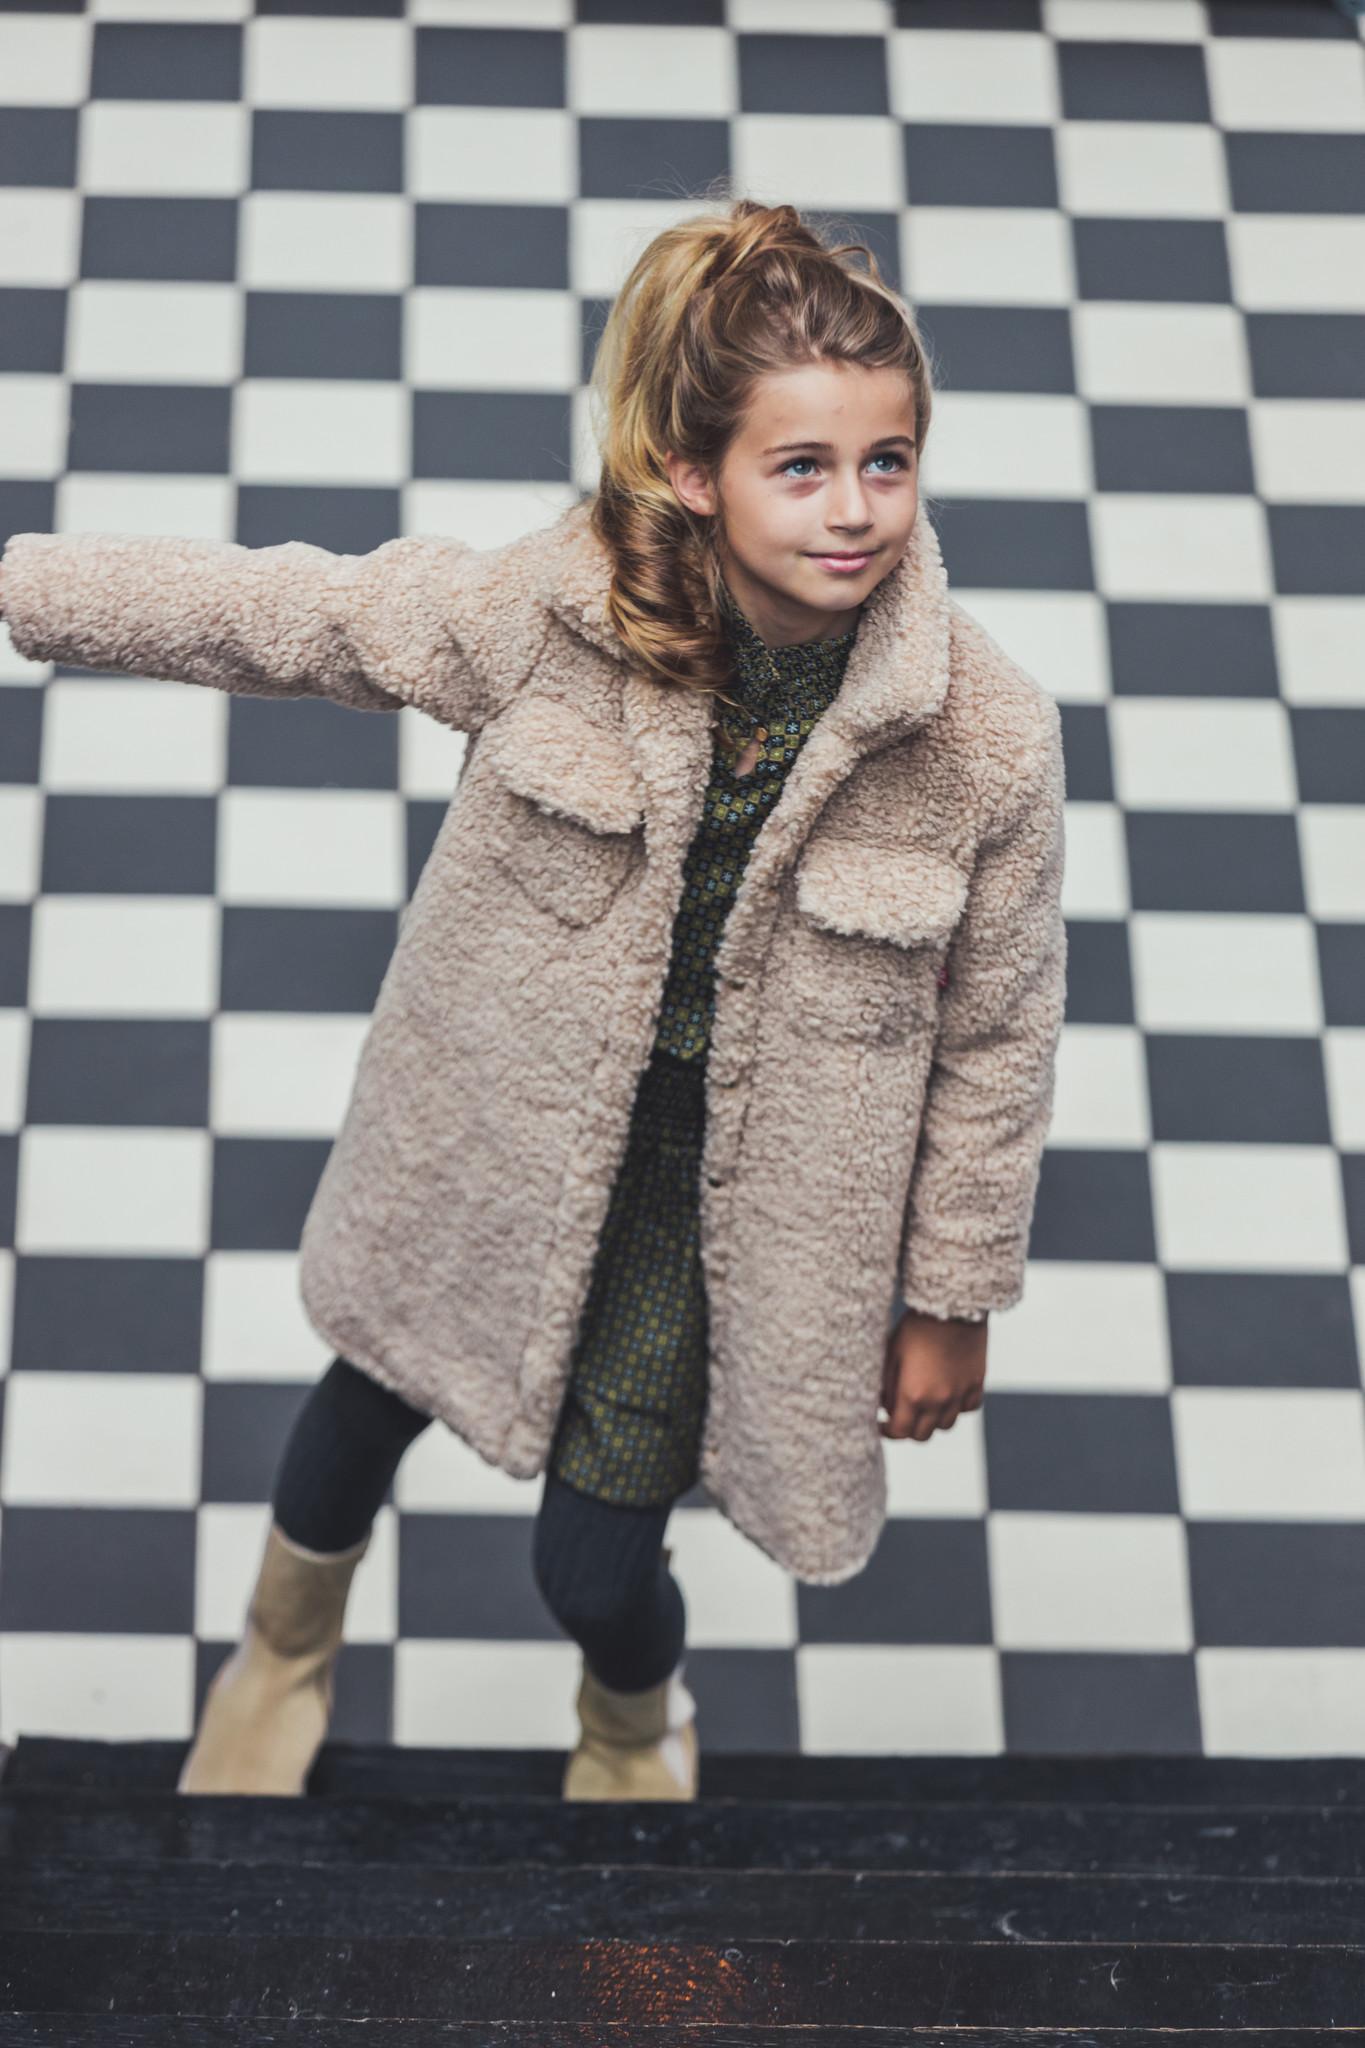 Mayce Girlslabel lookbook winter 2022-5